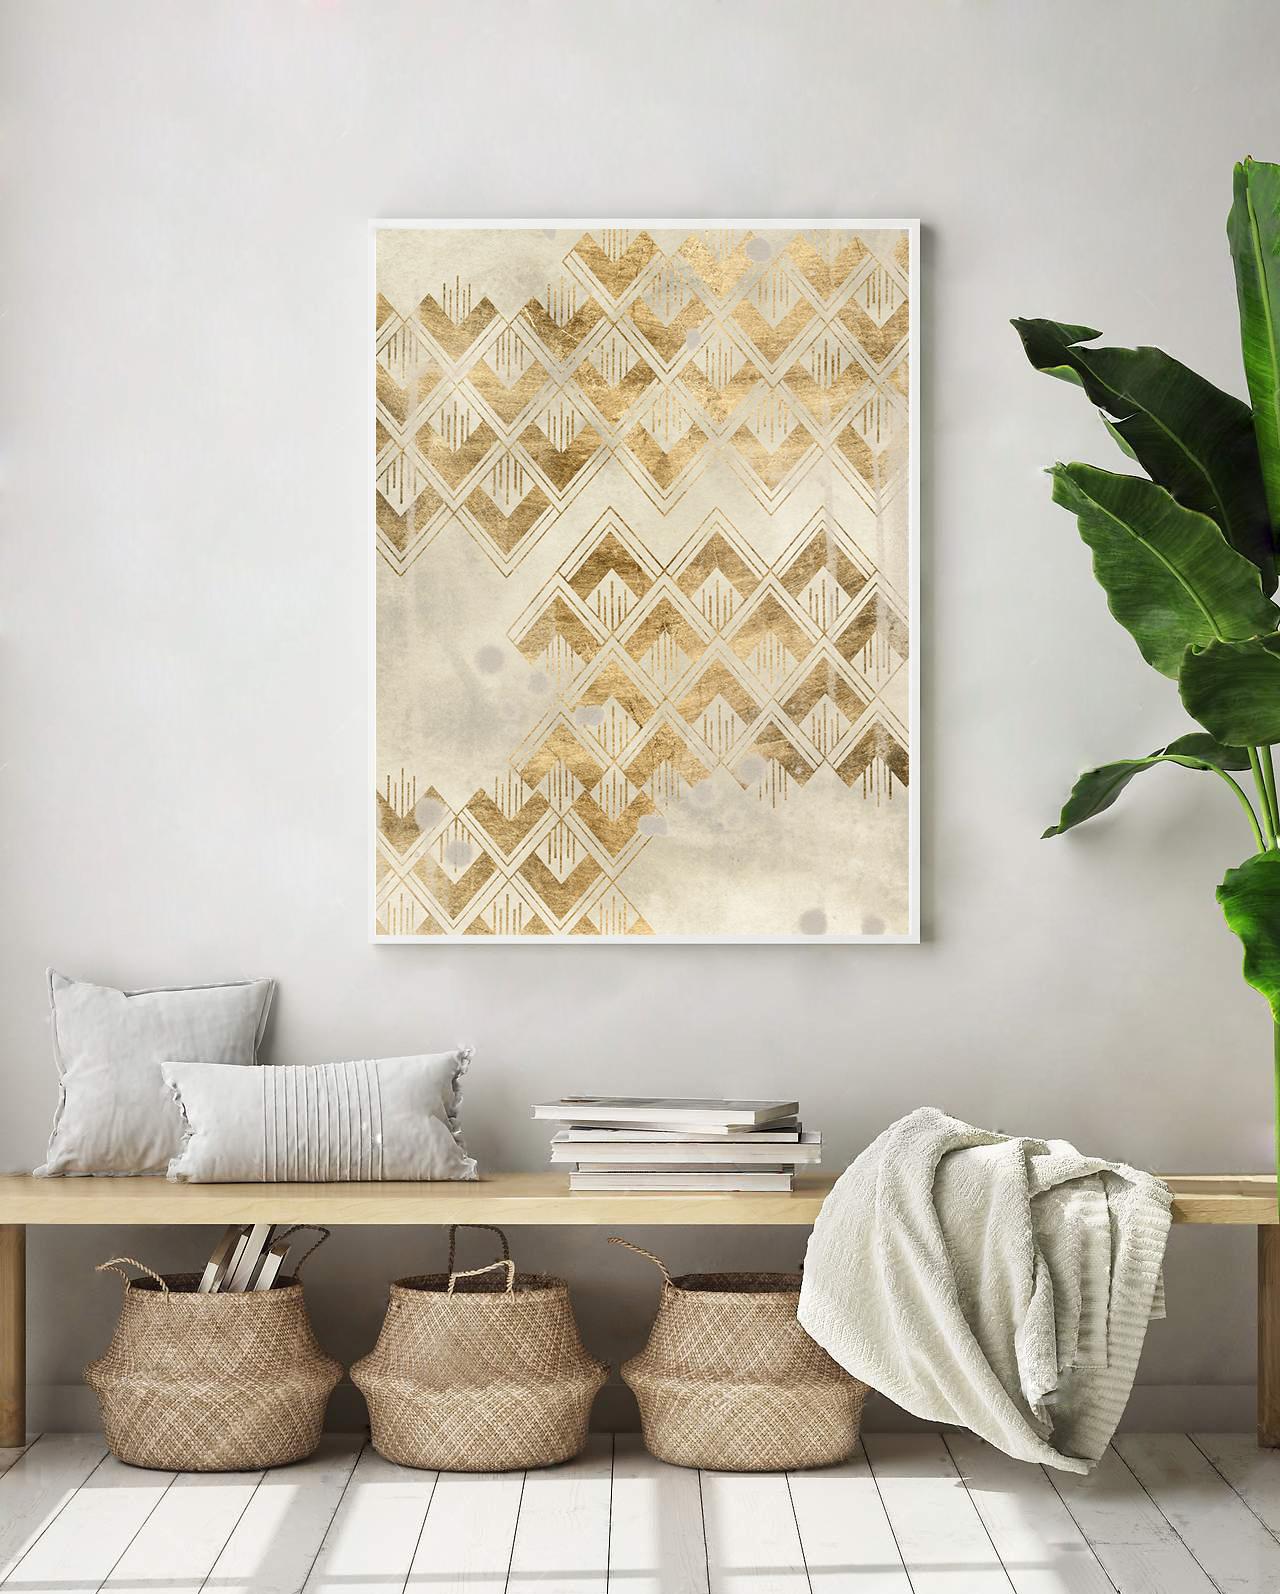 Deco Pattern in Cream